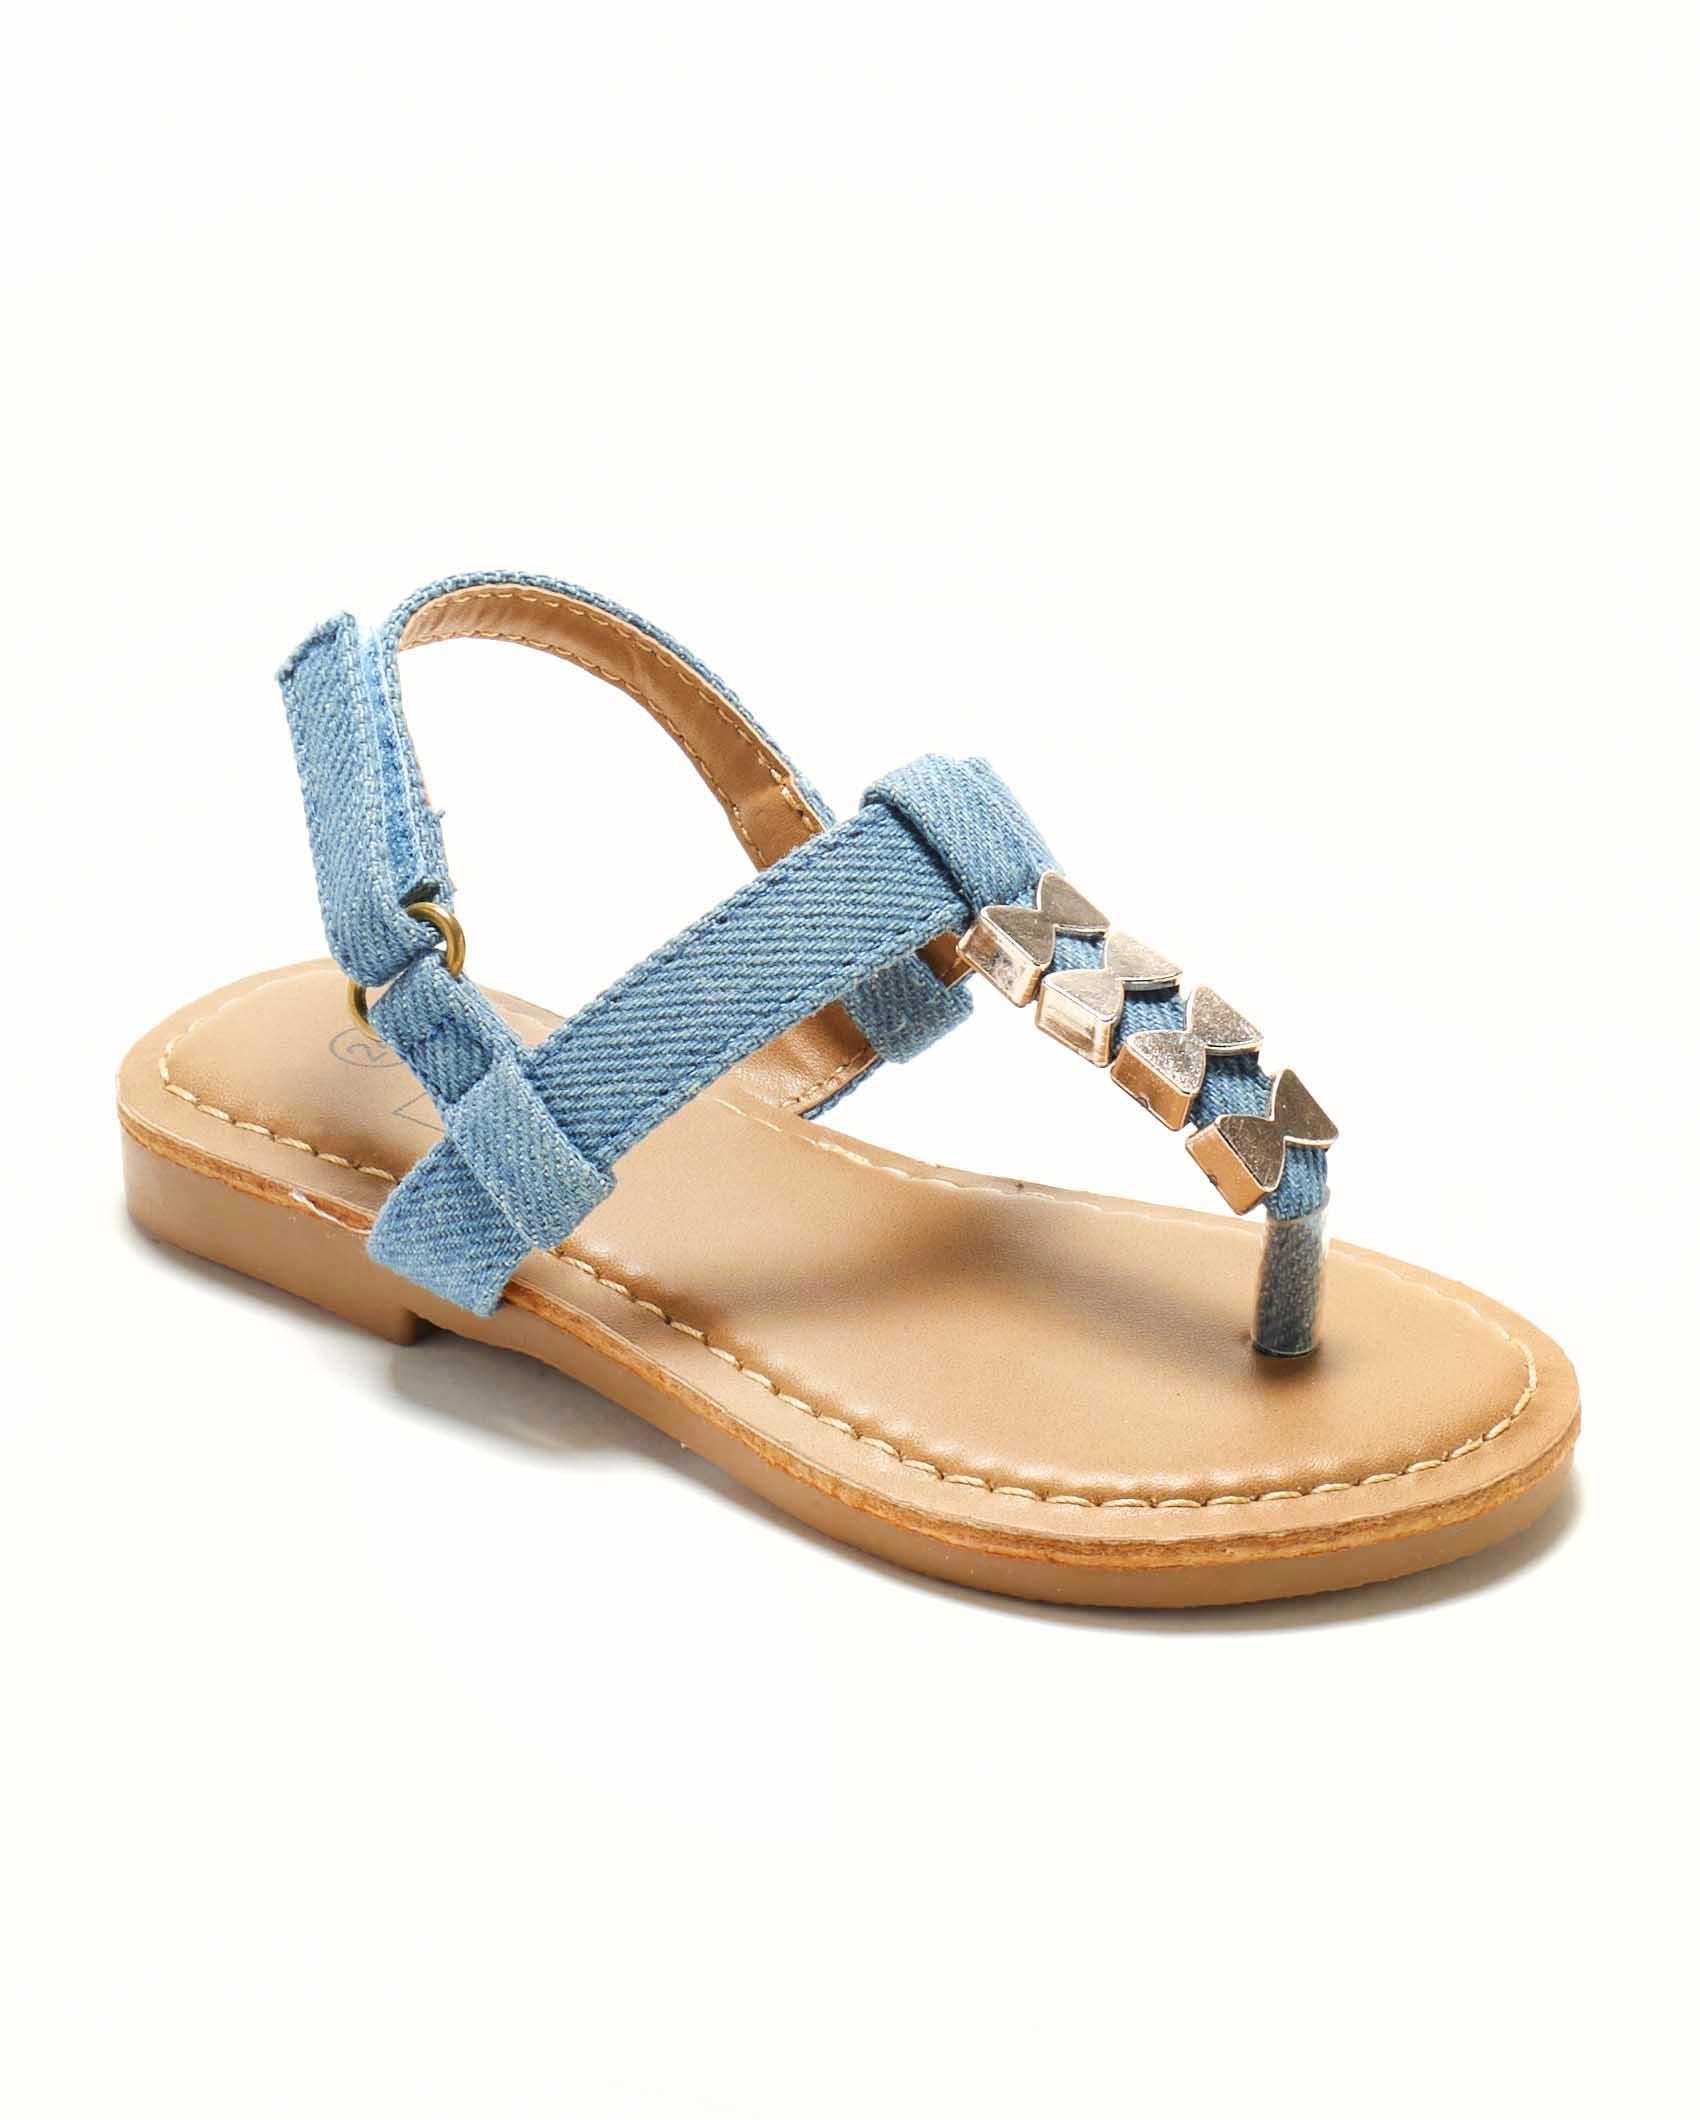 Sandales Fille - Sandale Ouverte Denim Jina - Saou Freewalk4